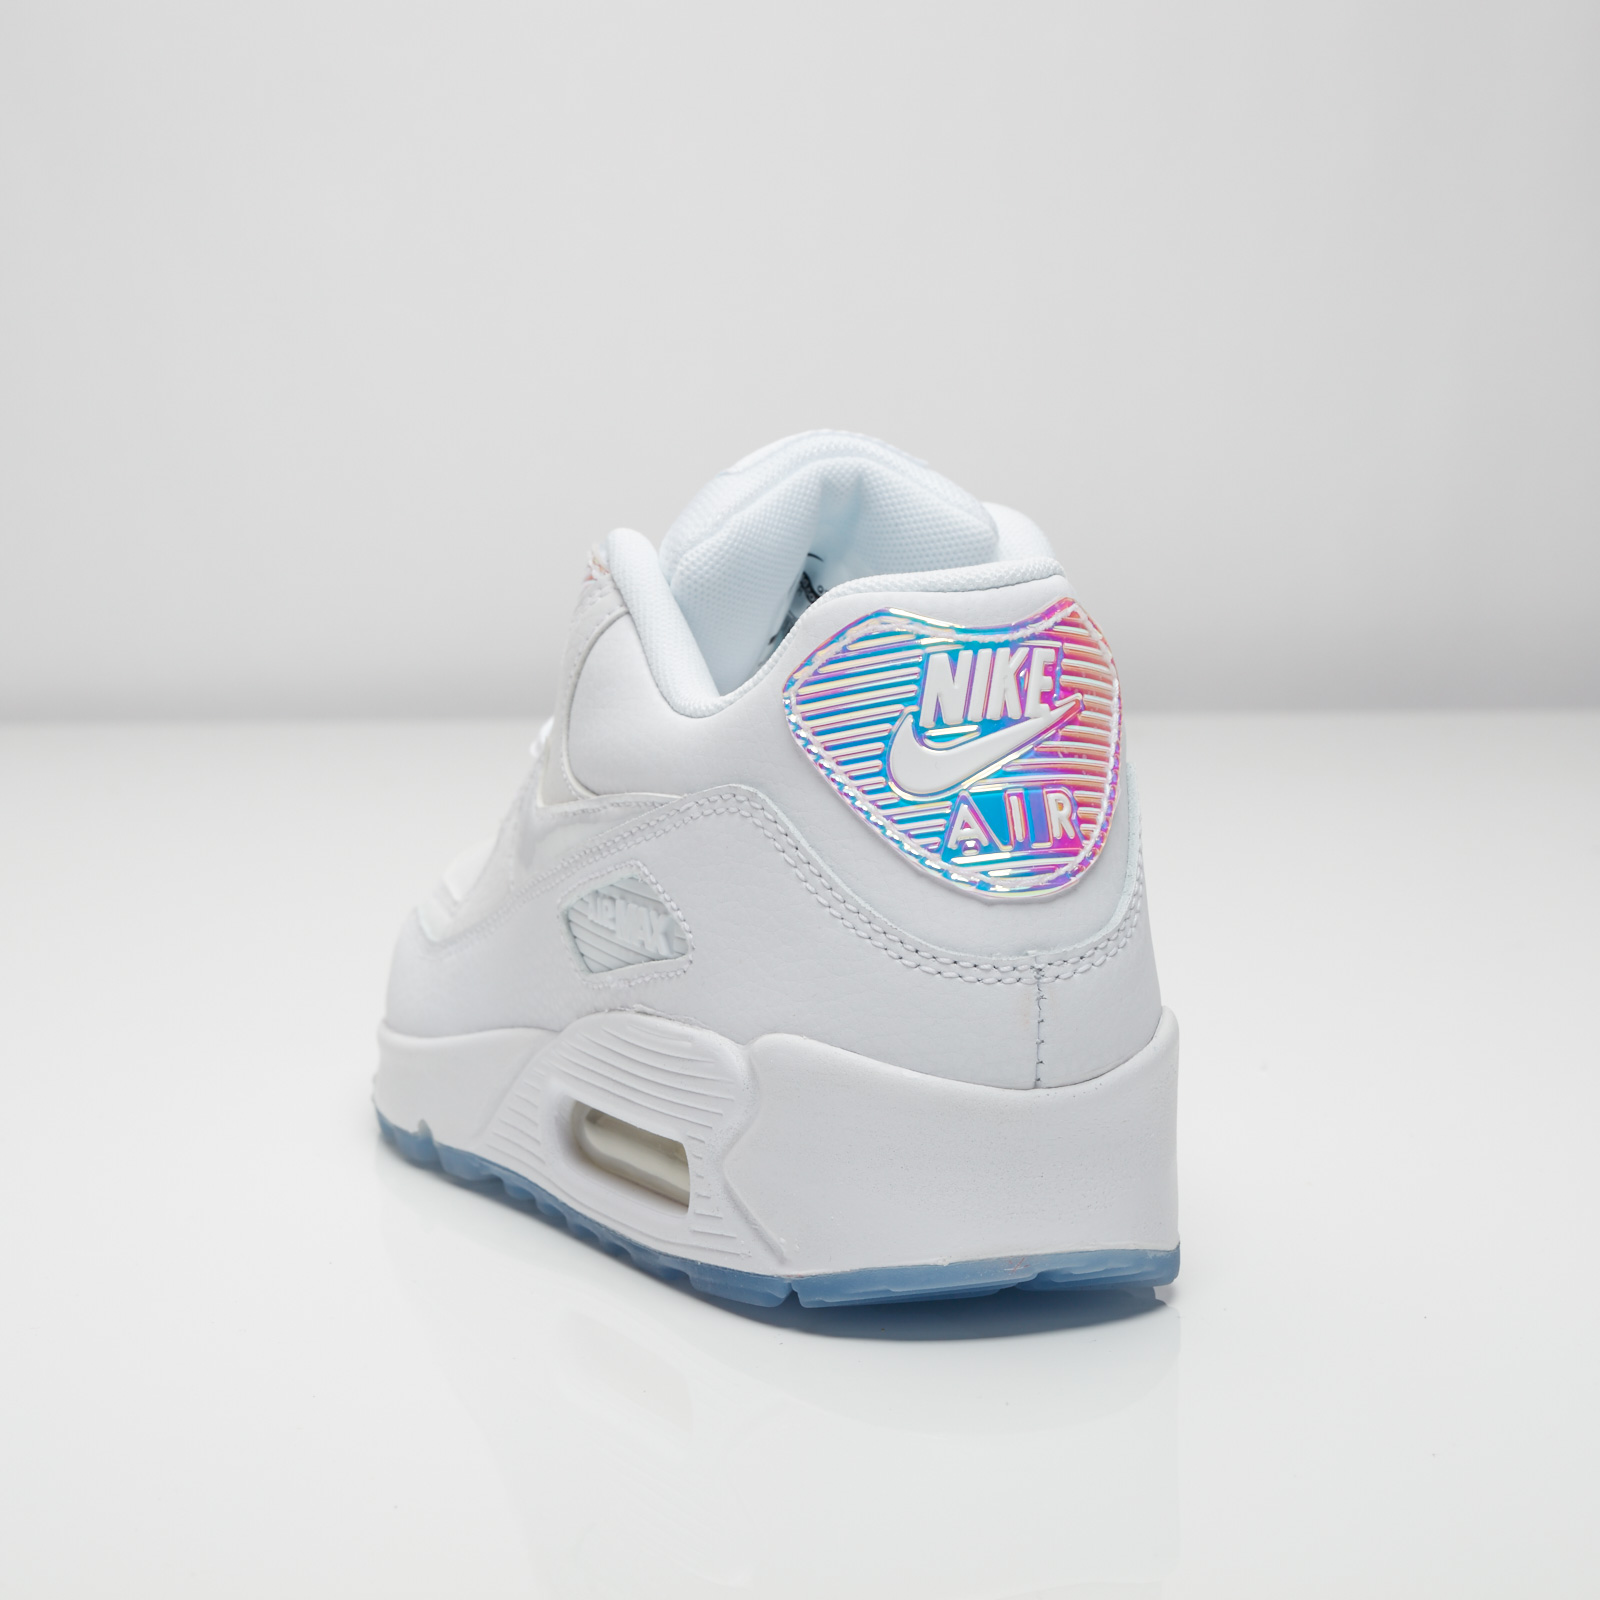 "0694ffbda4 Nike Womens Air Max 90 PRM LEA Running Trainers 904535 Sneakers Shoes (US  8, Nike Air Max 90 Premium ""Cobblestone"" Available Now ... Nike Wmns Air  Max 90 ..."